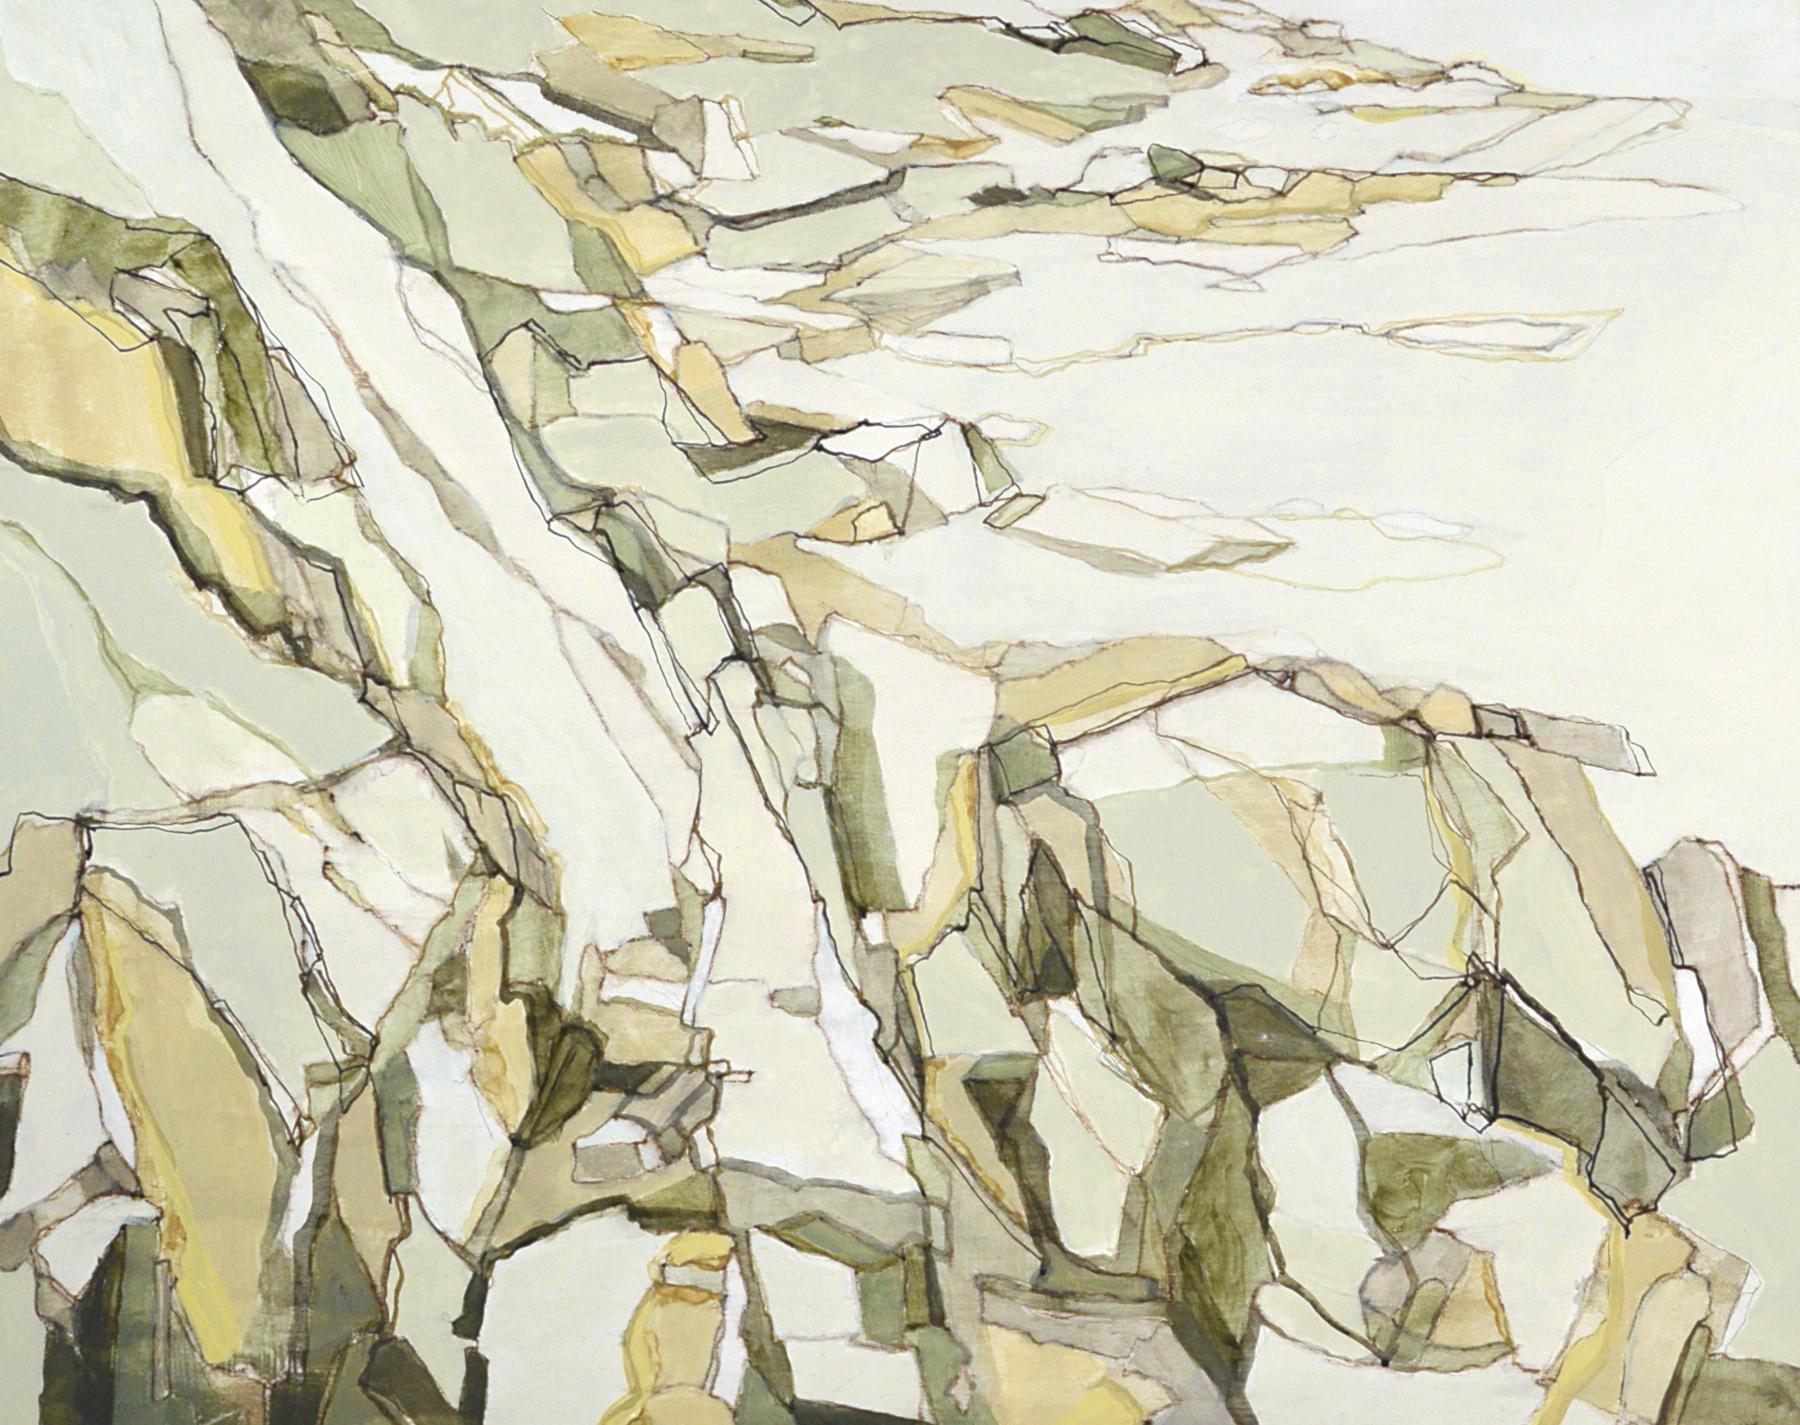 """Tumble Down Rock"", mixed media on panel, 16x20"